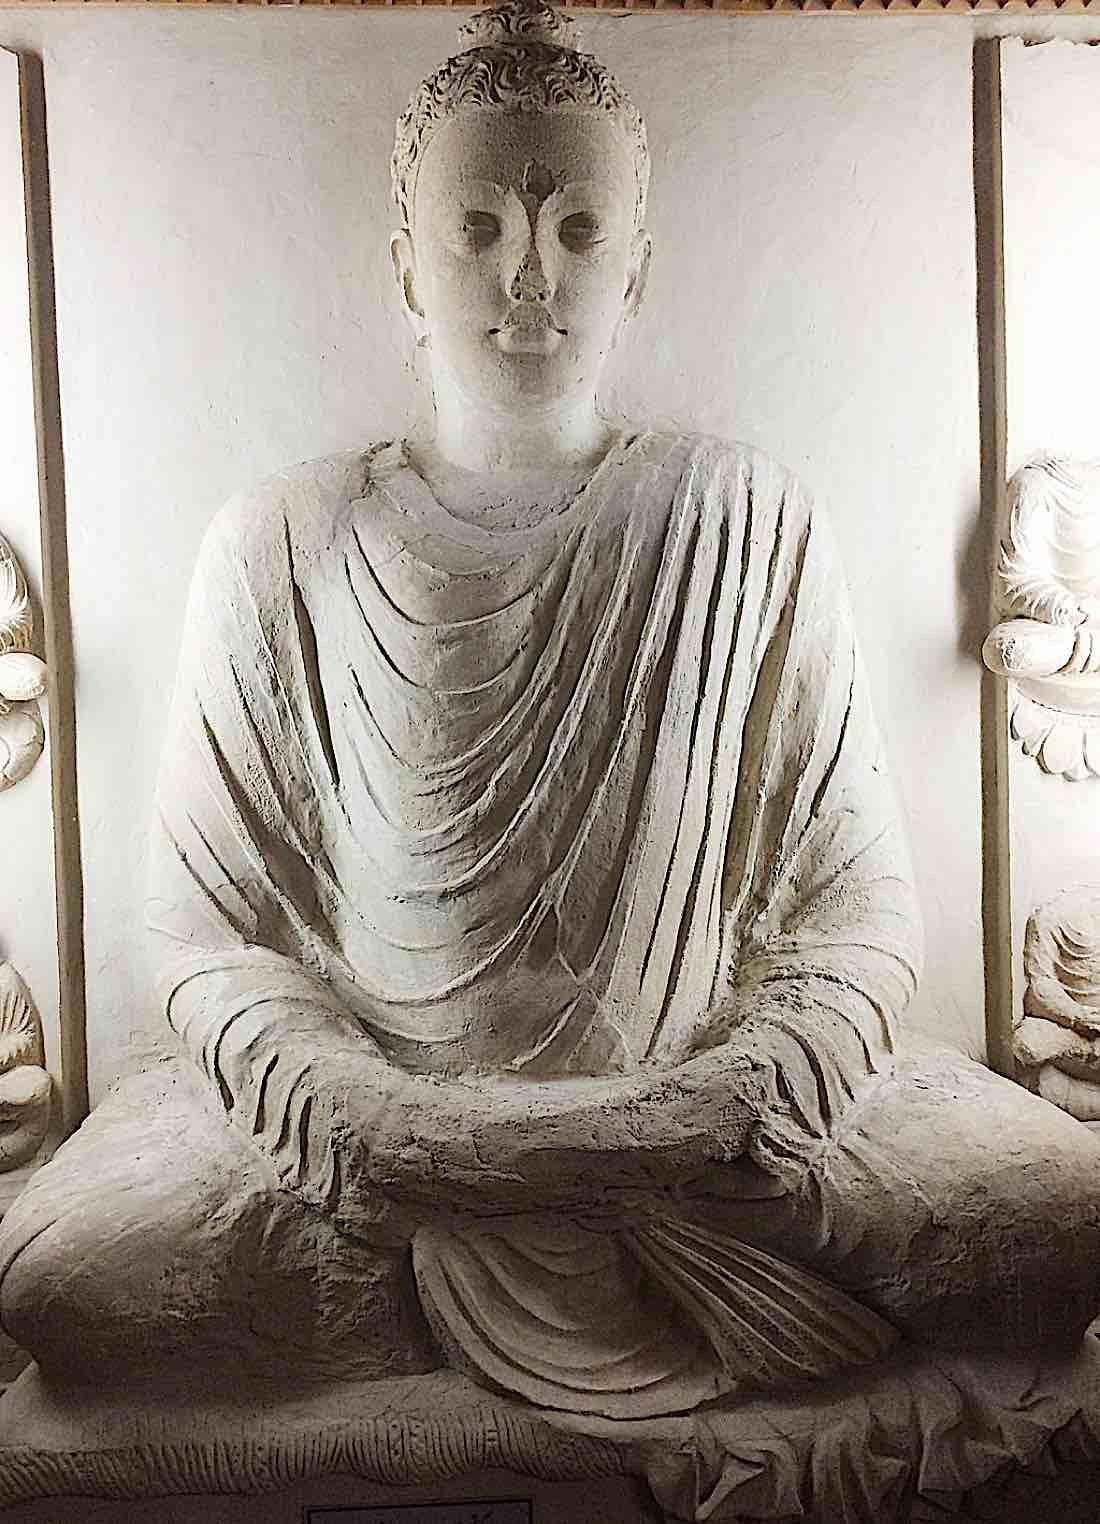 Buddha Weekly 1024px Meditating Budha at Taxila Museum Pakistan Buddhism